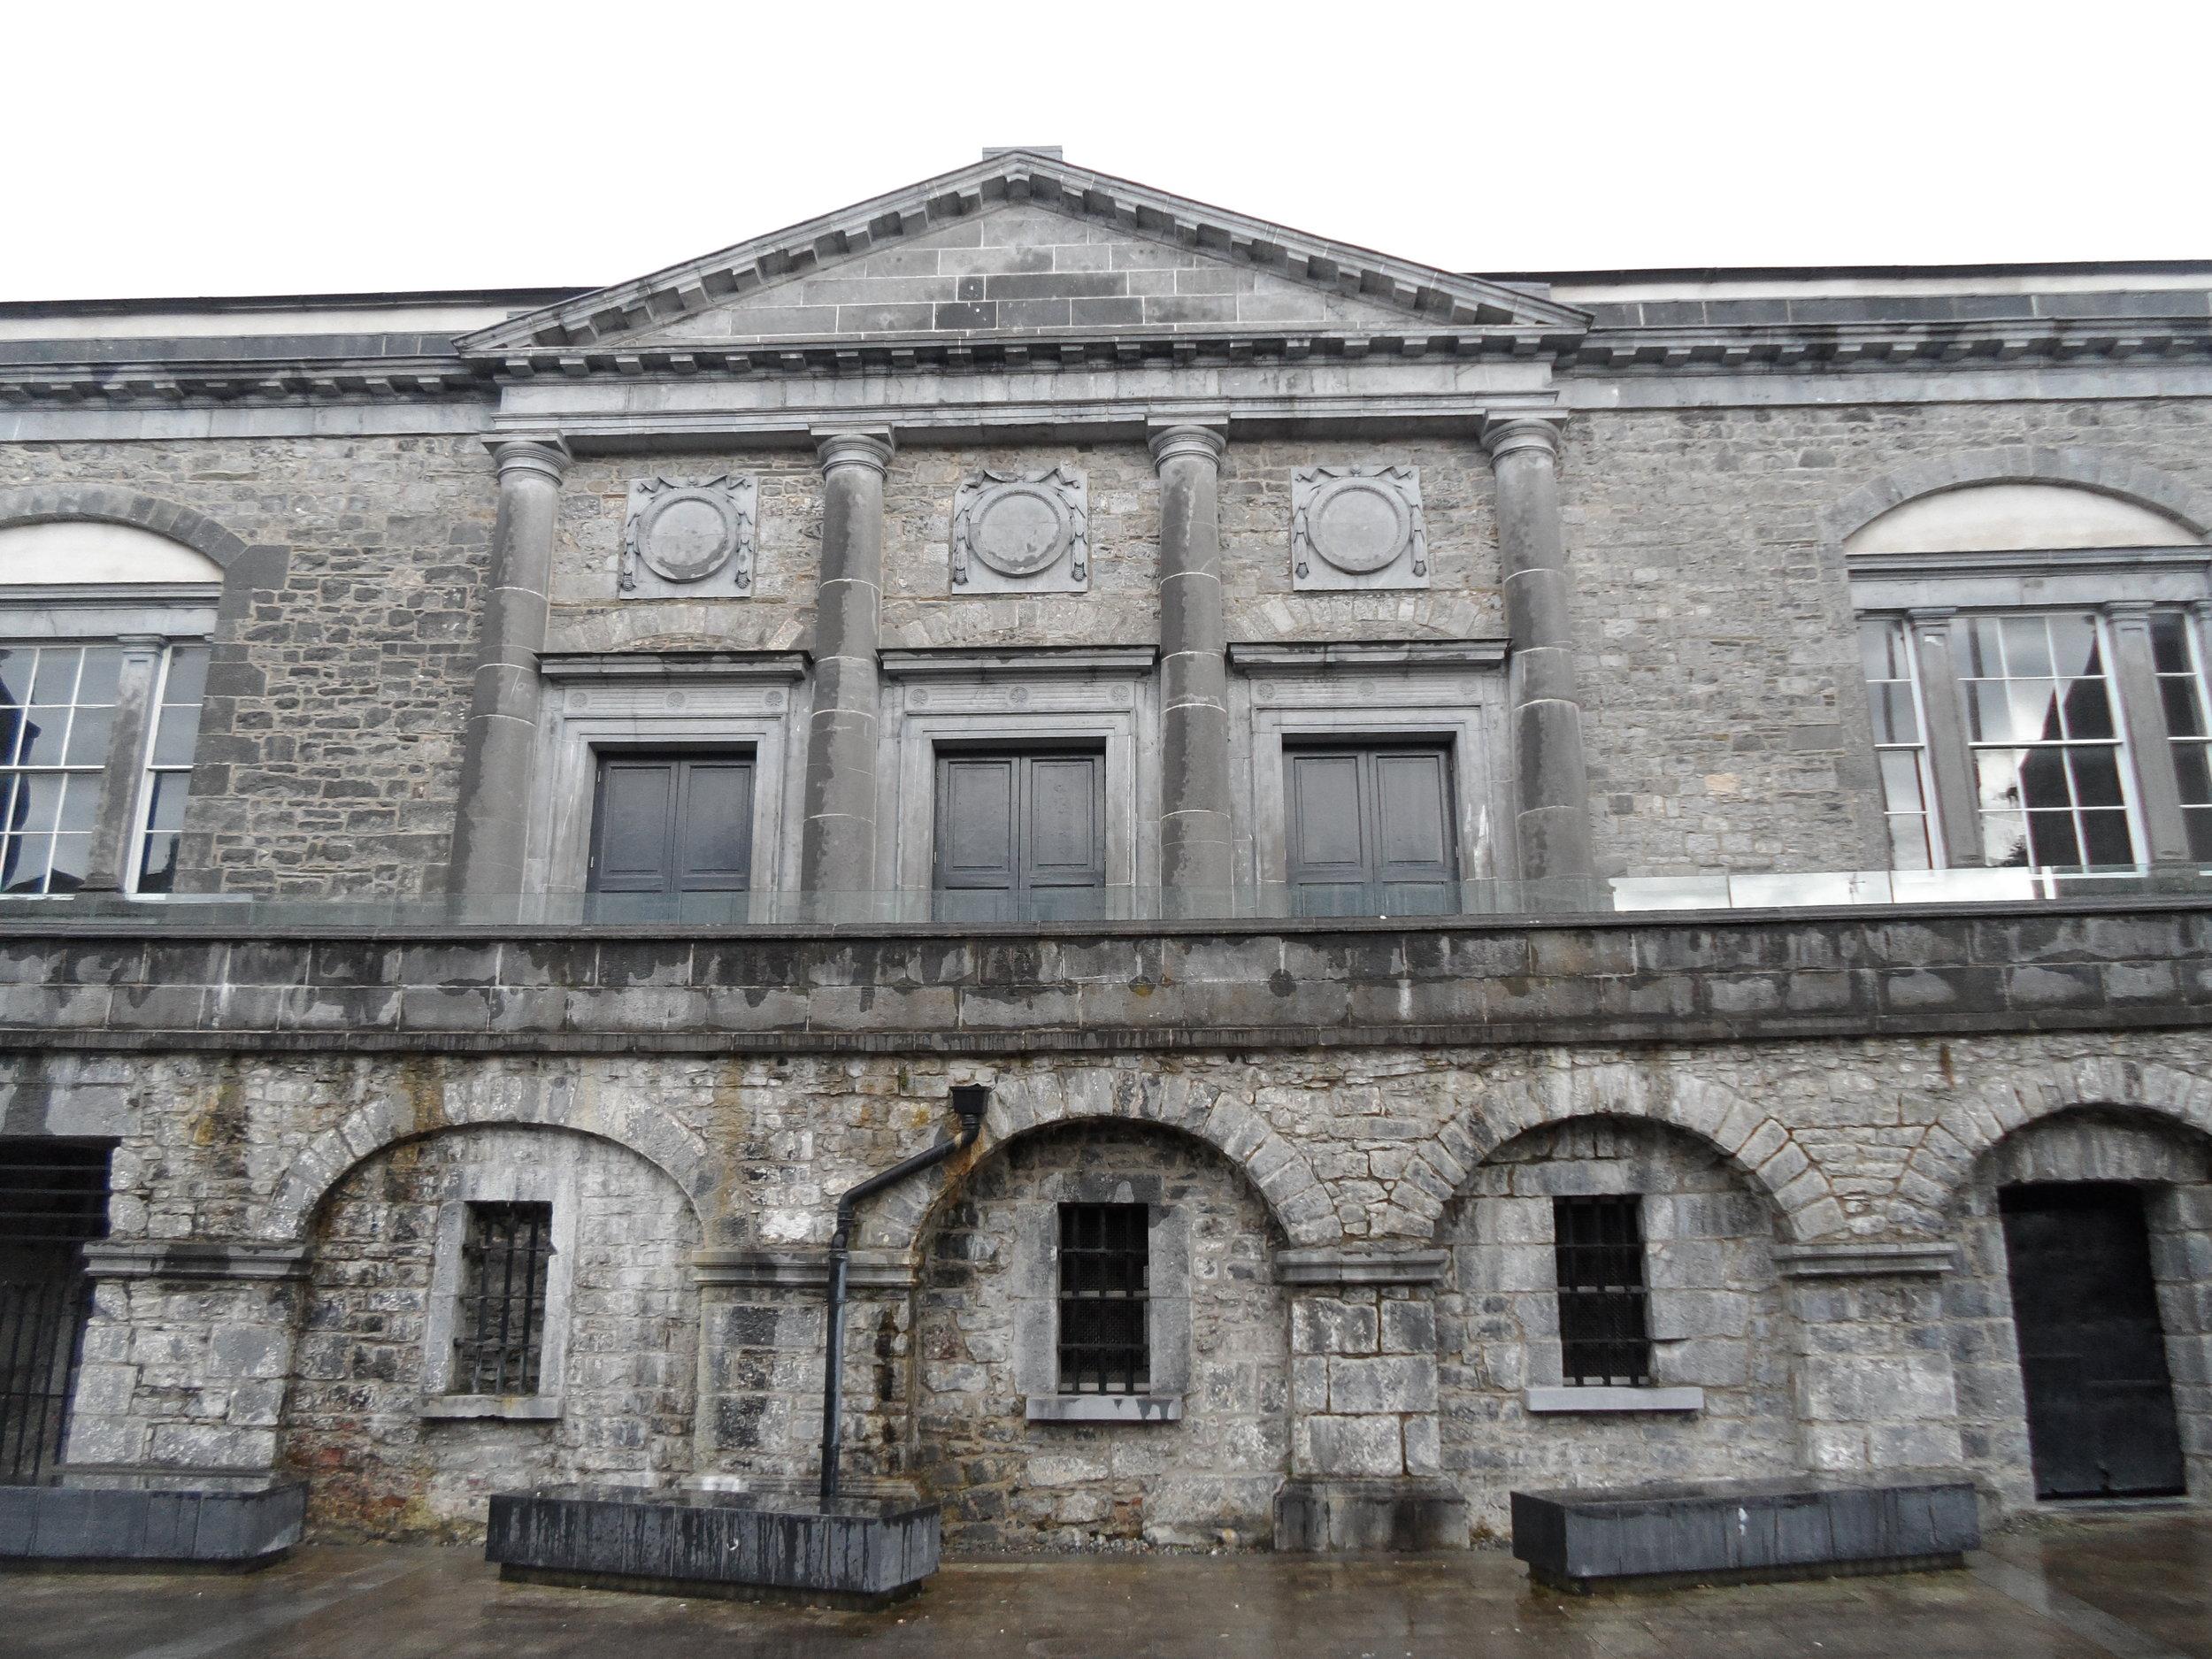 Kilkenny Jail